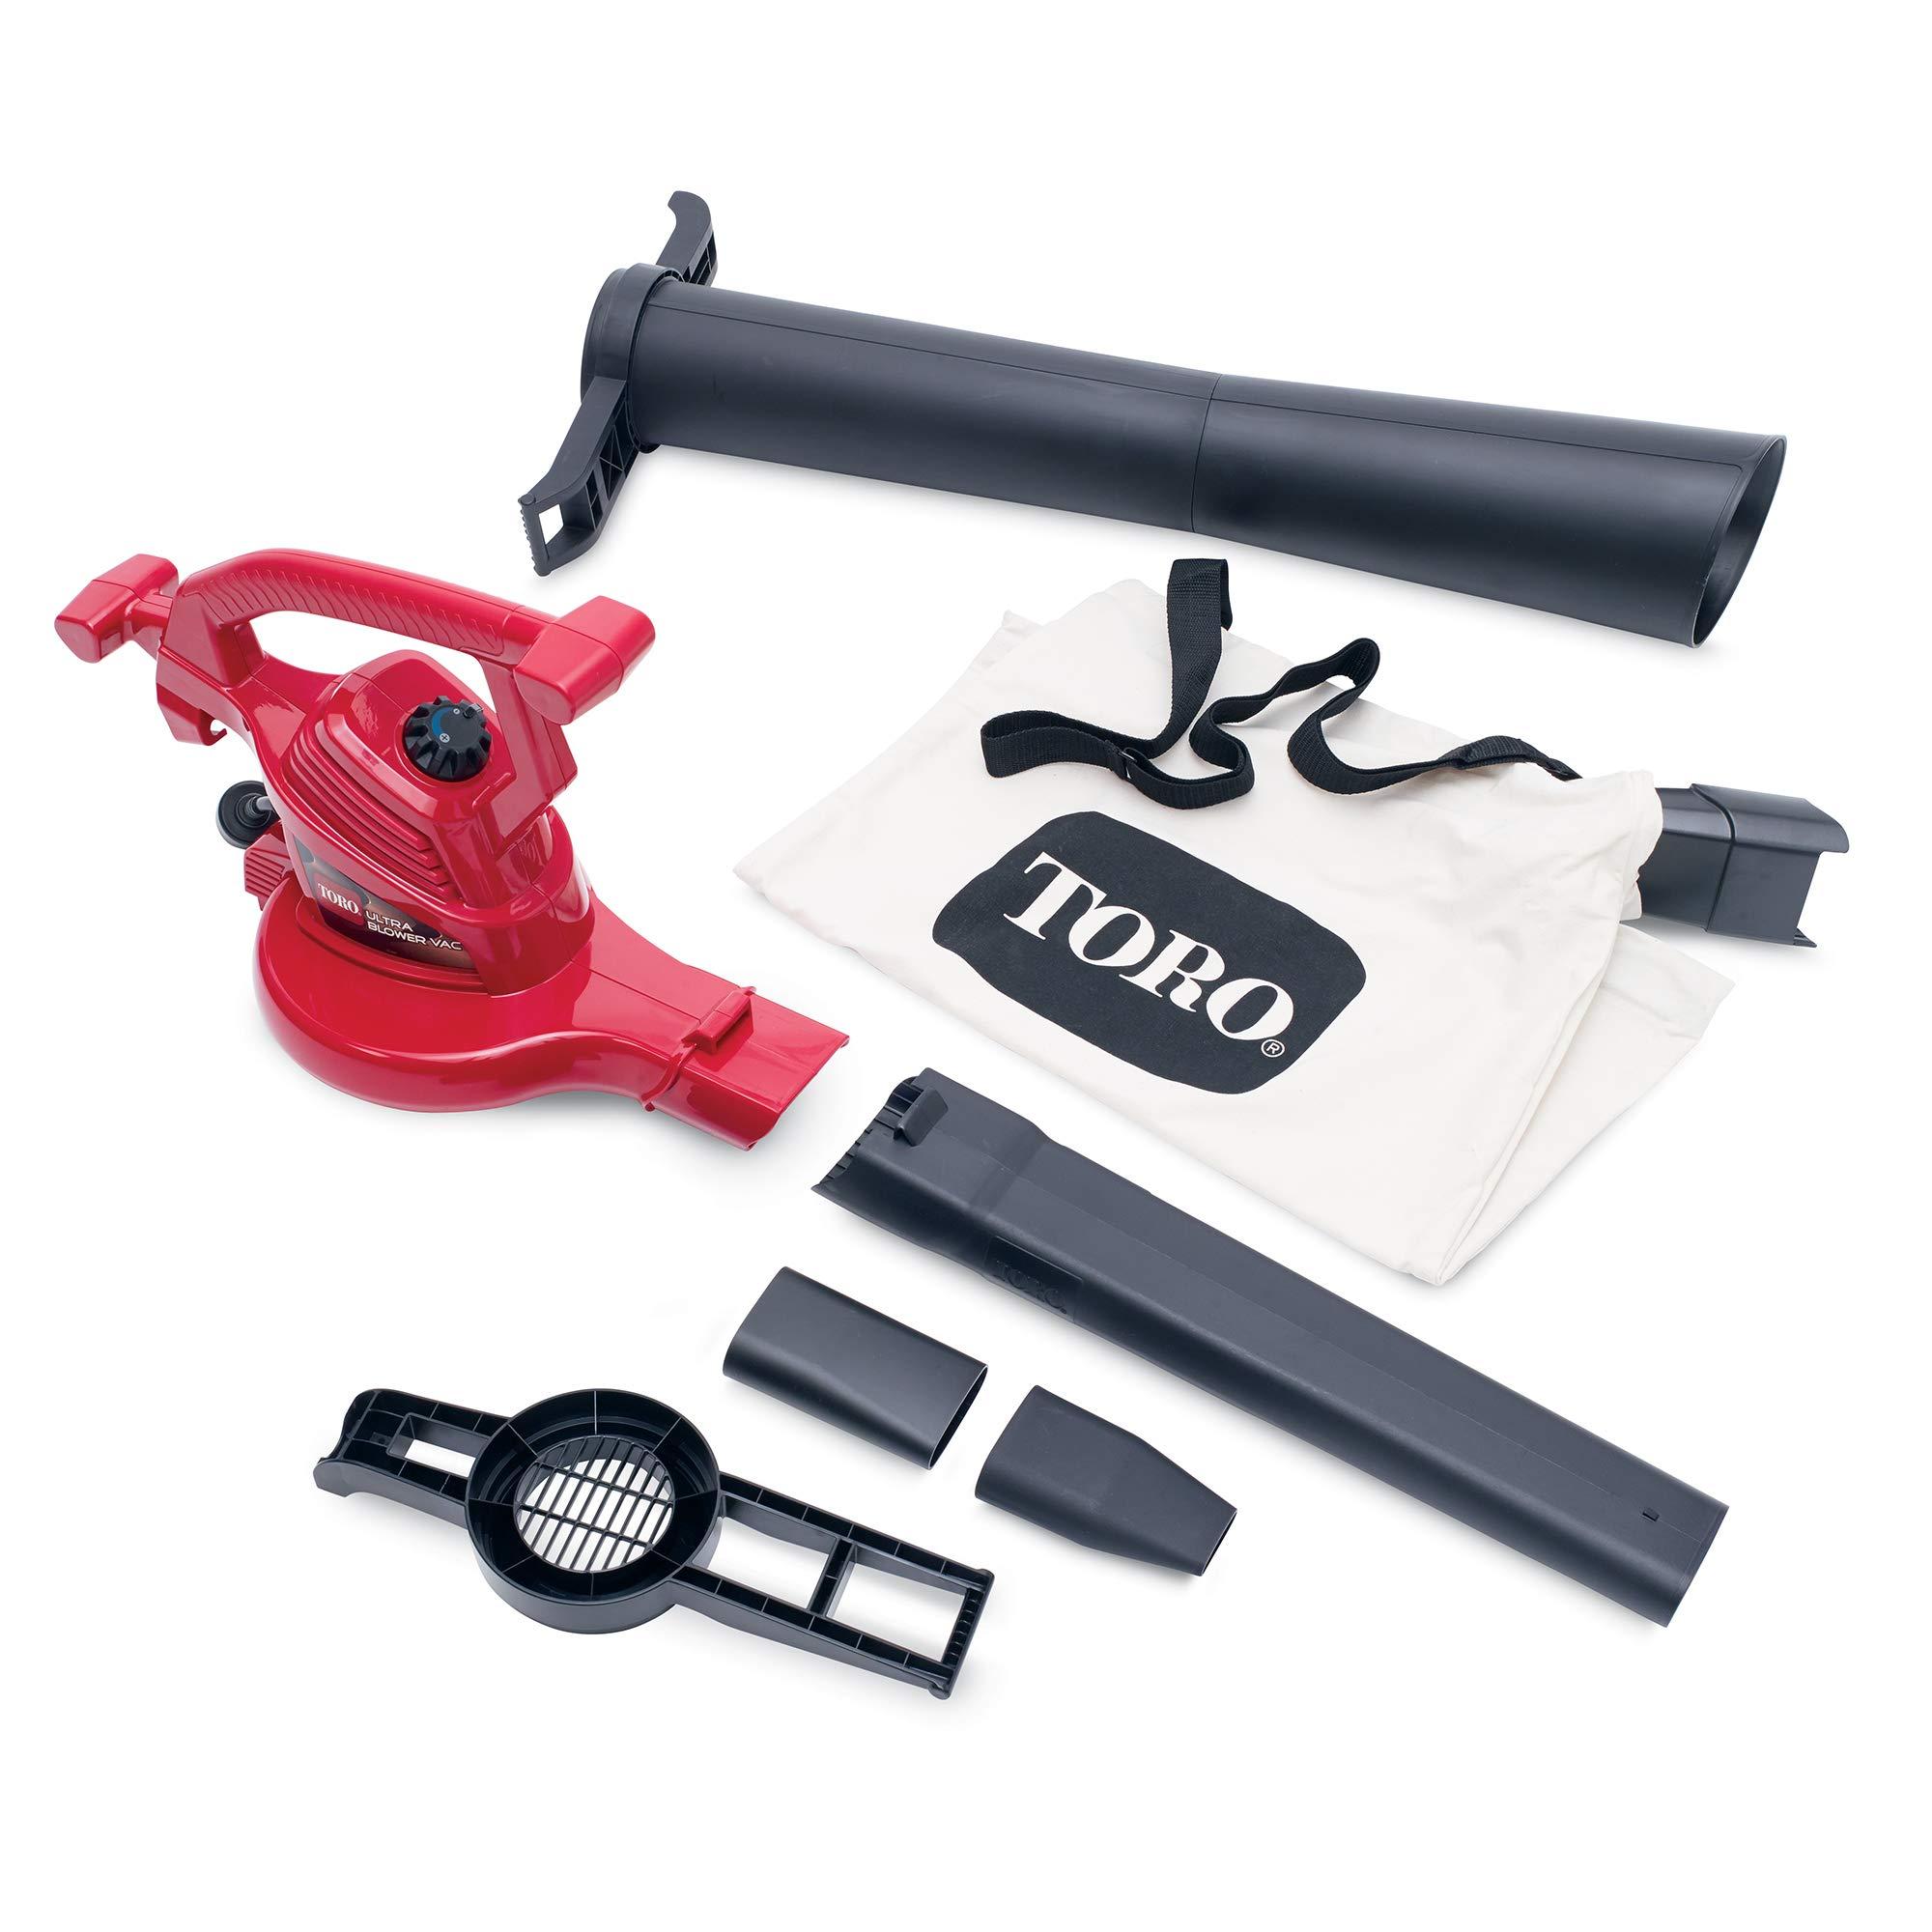 Toro 51619 Ultra Electric Blower Vac, 250 mph, Red by Toro